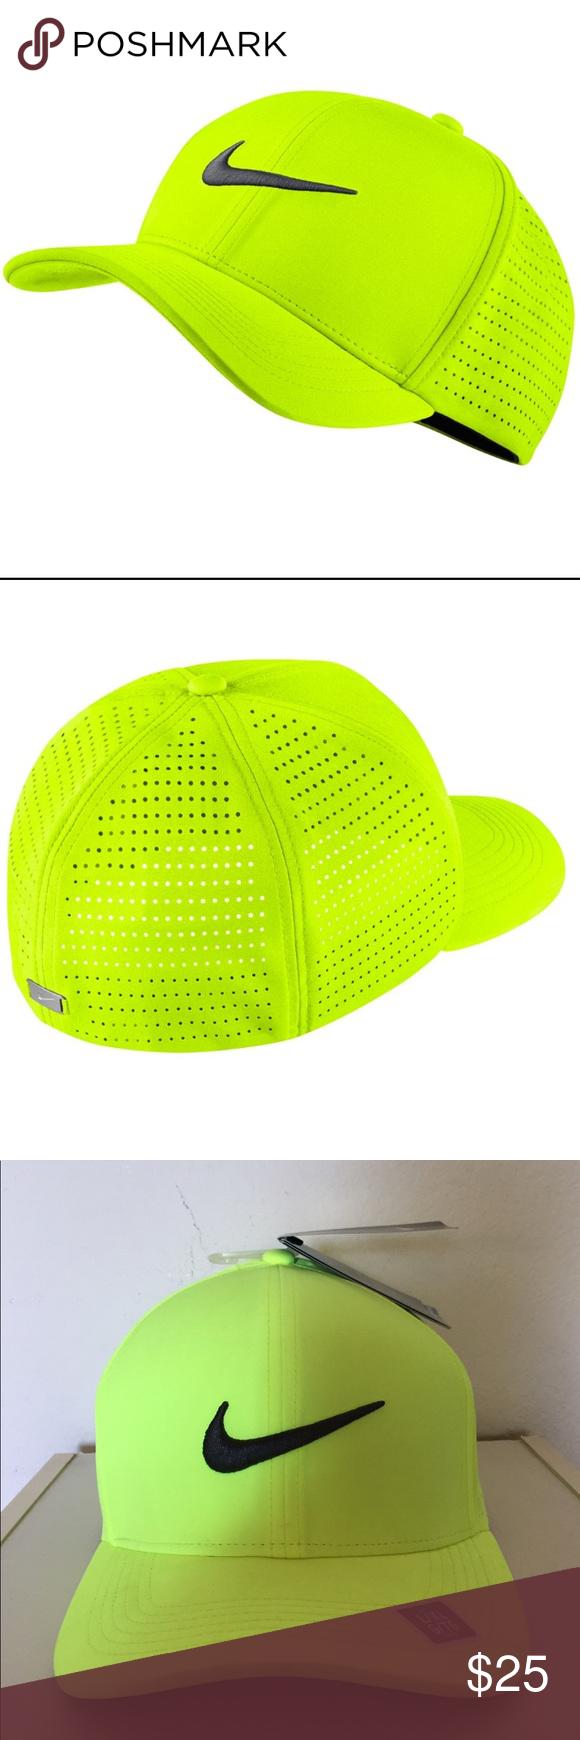 Nike Classic99 Perforated Golf Hat L Xl Volt Nike Fashion Nike Nike Swoosh Logo